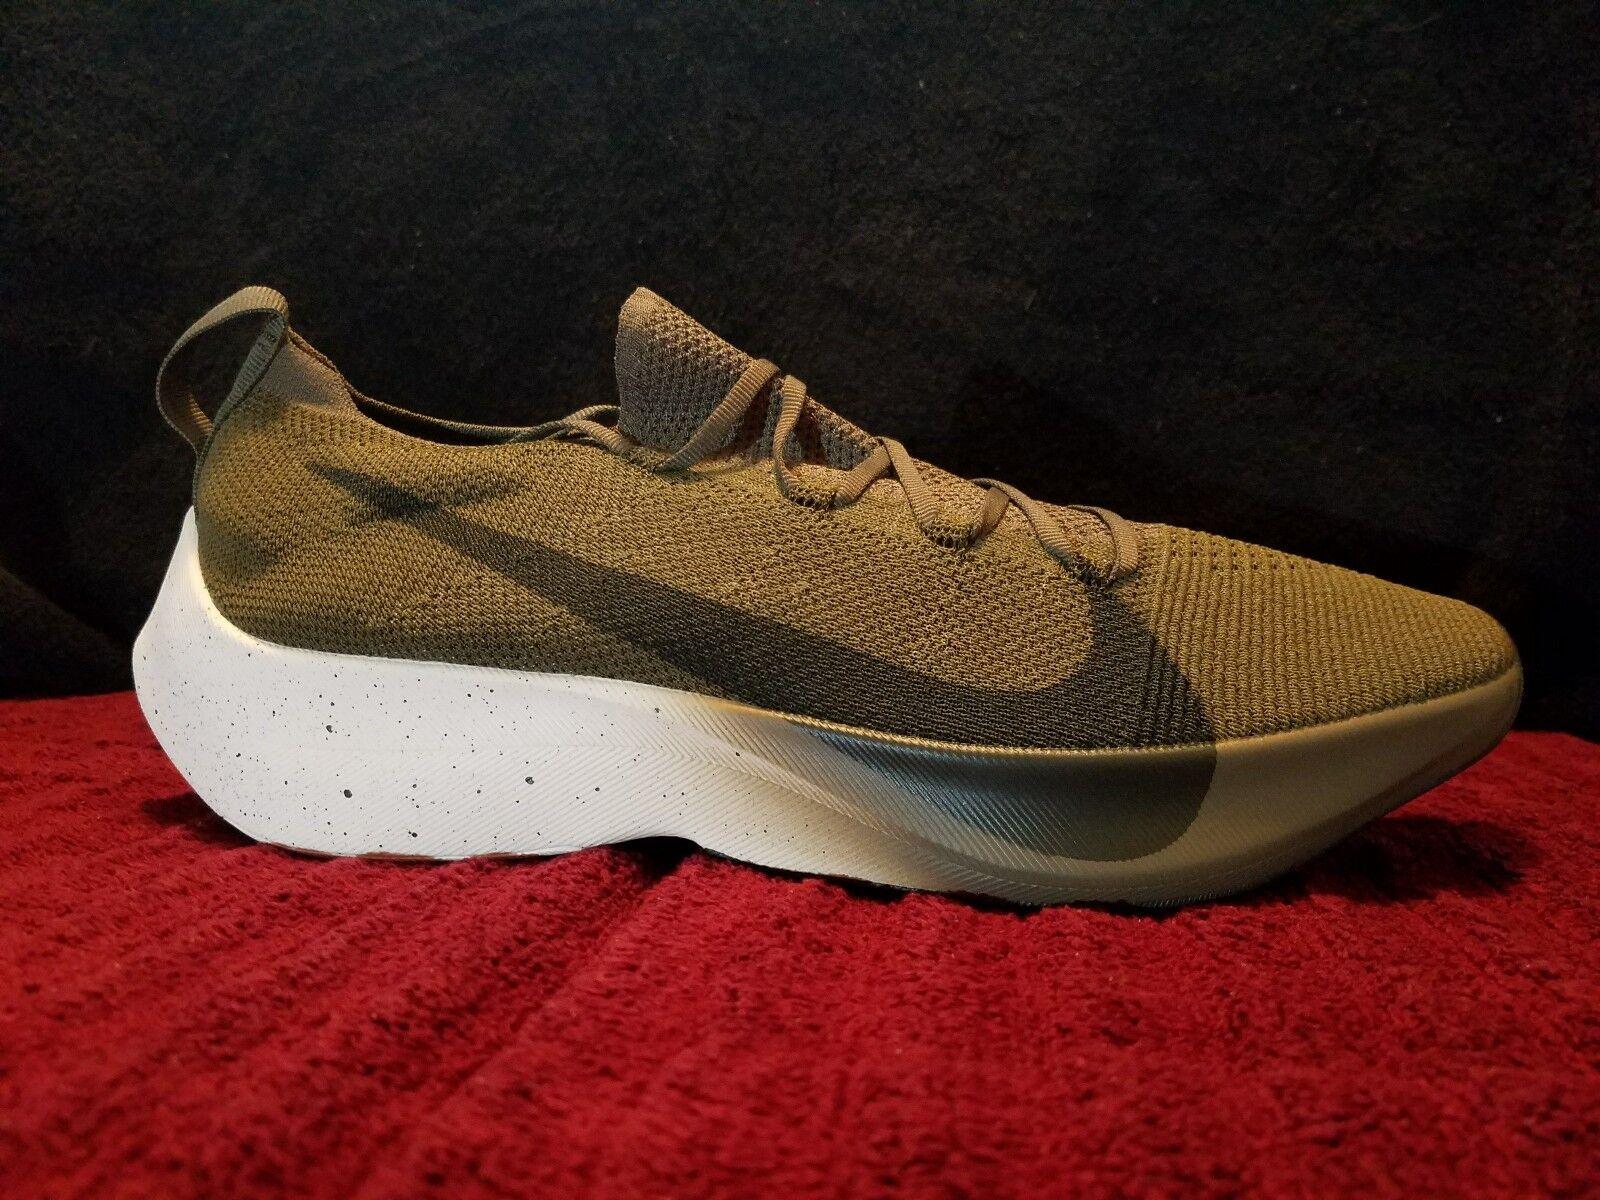 Nike street reagire vapore street Nike flyknit olive aq1763-201 numero 11 a3c391